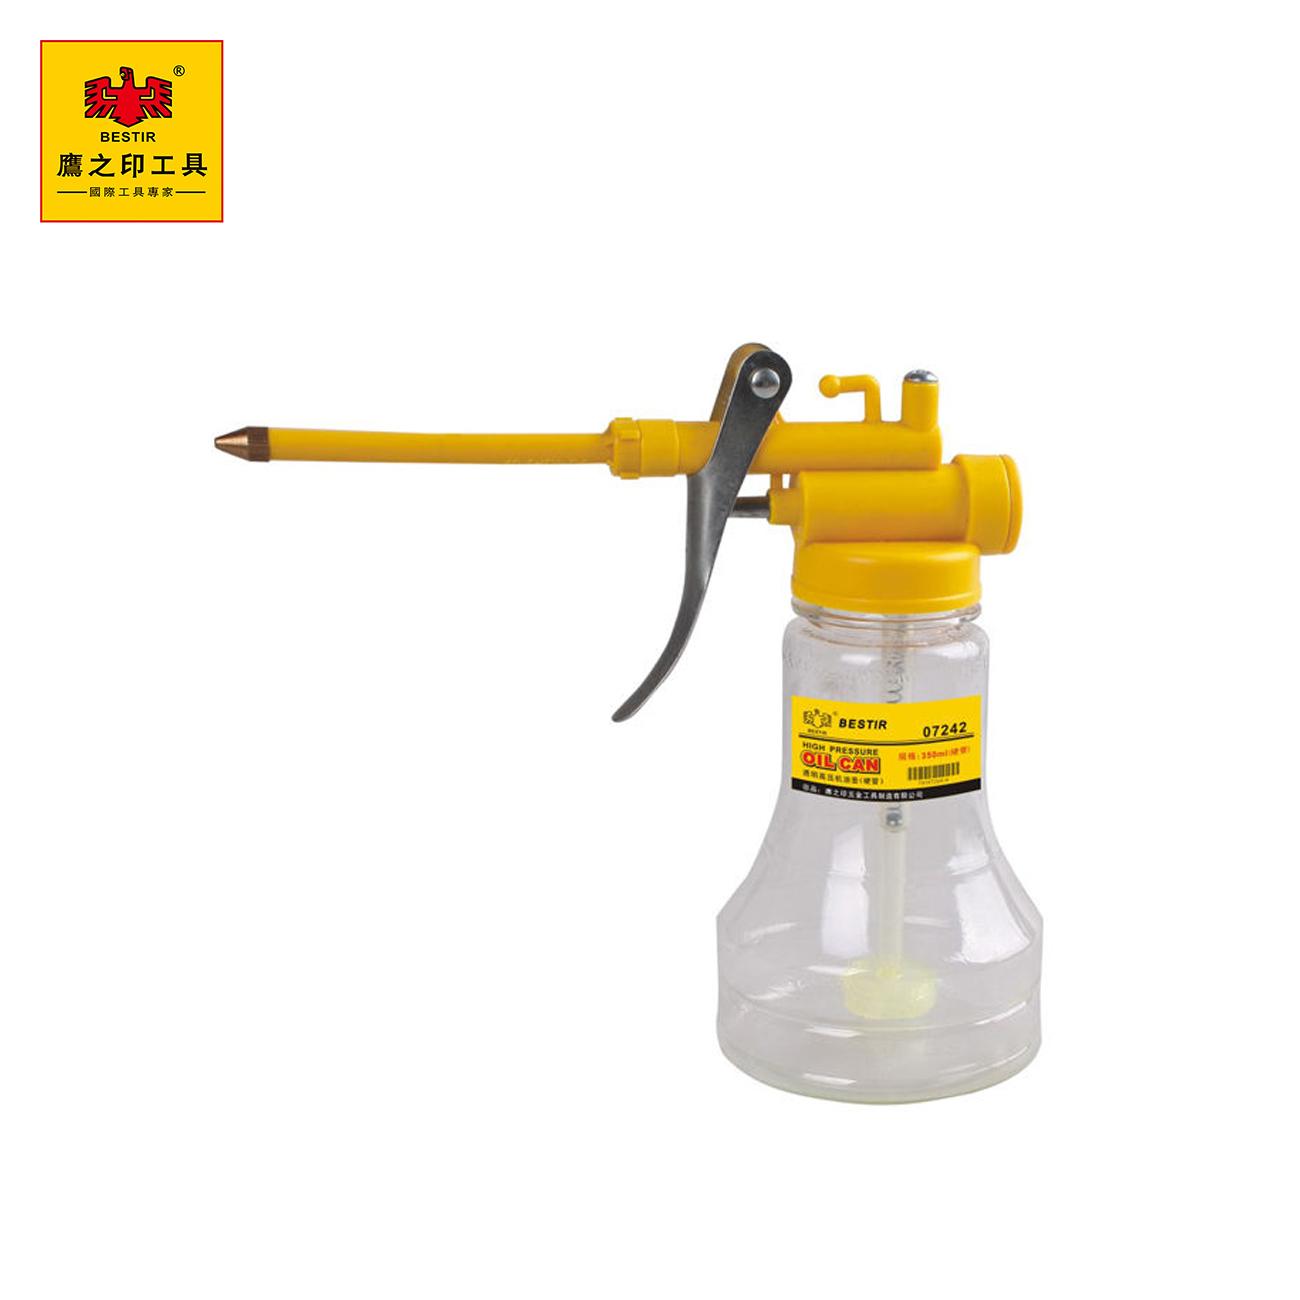 BST-07242/350ml透明高压机油壶(硬管)/鹰之印